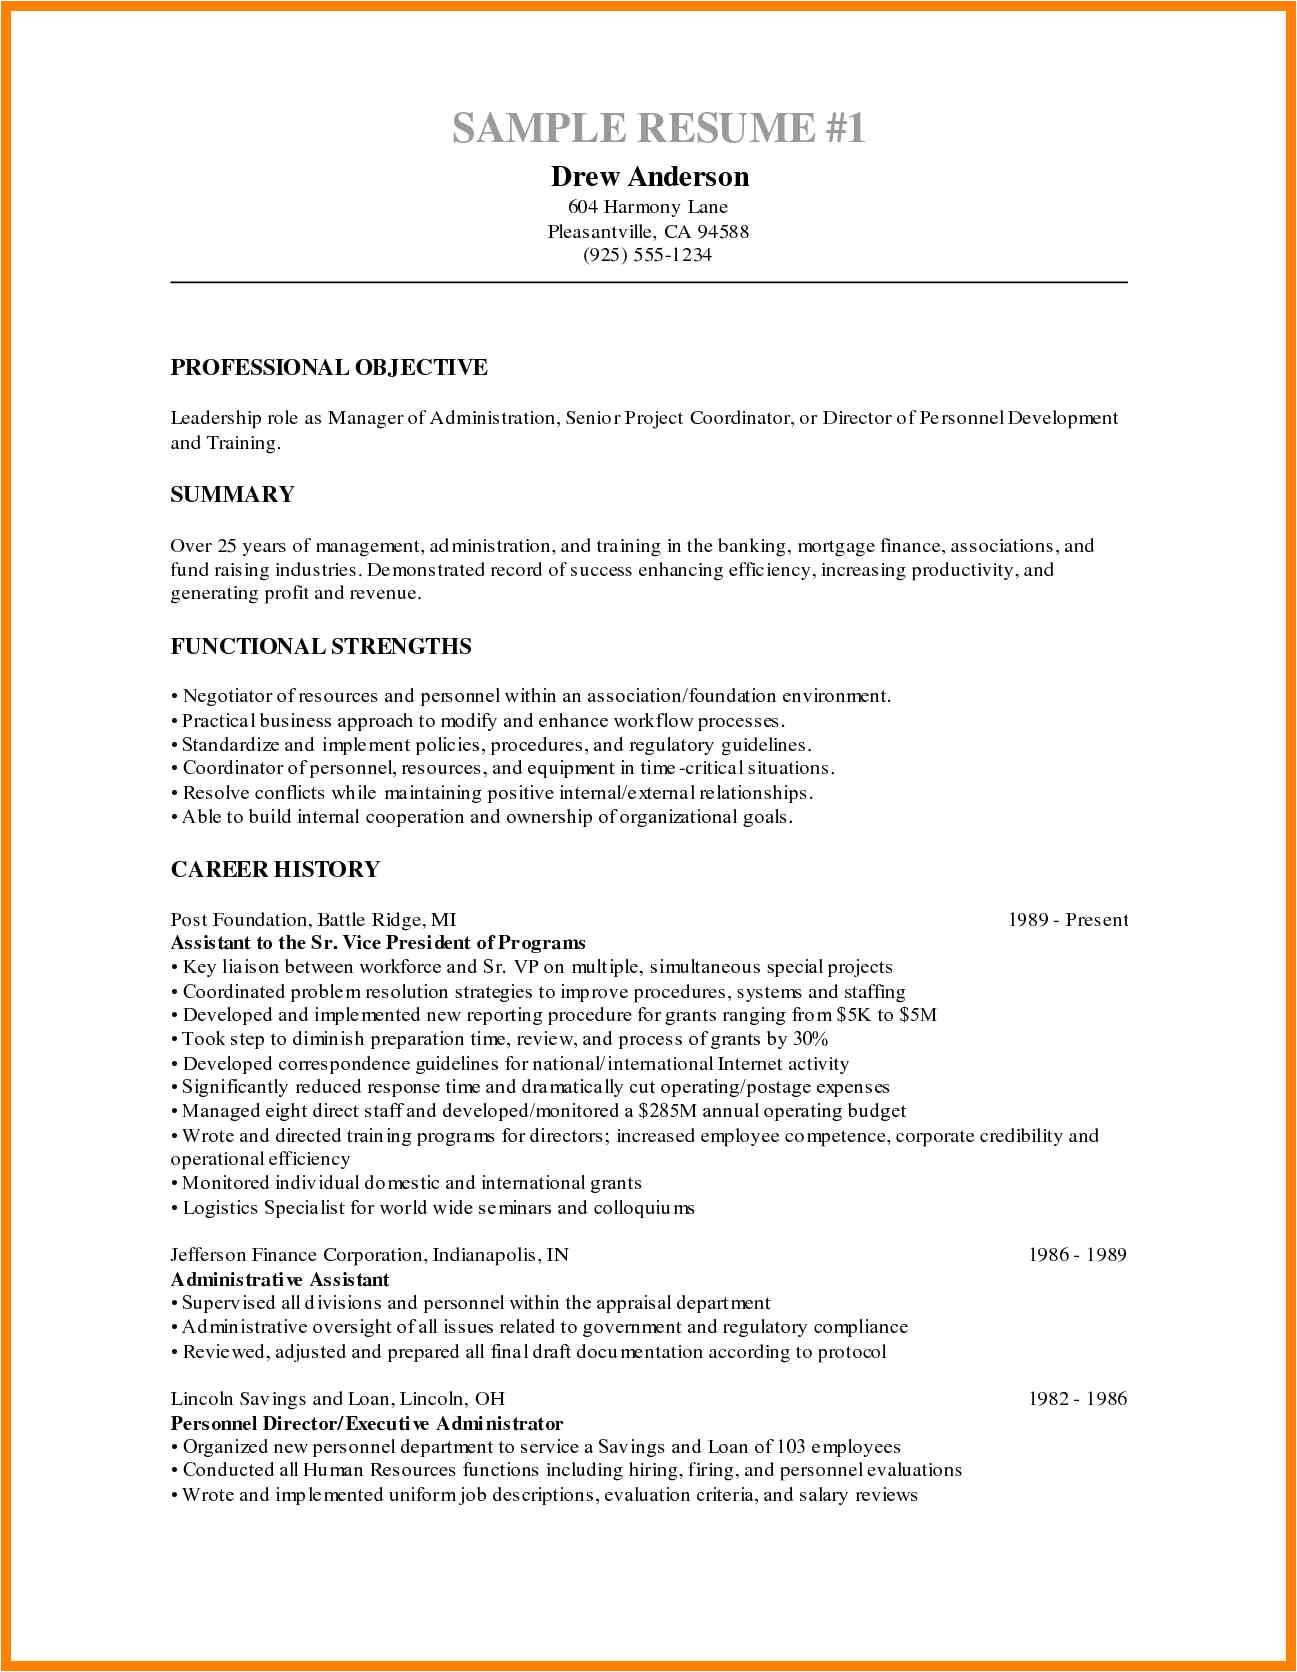 Sample Objectives In Resume for Call Center Agent Call Center Agent Resume Annecarolynbird